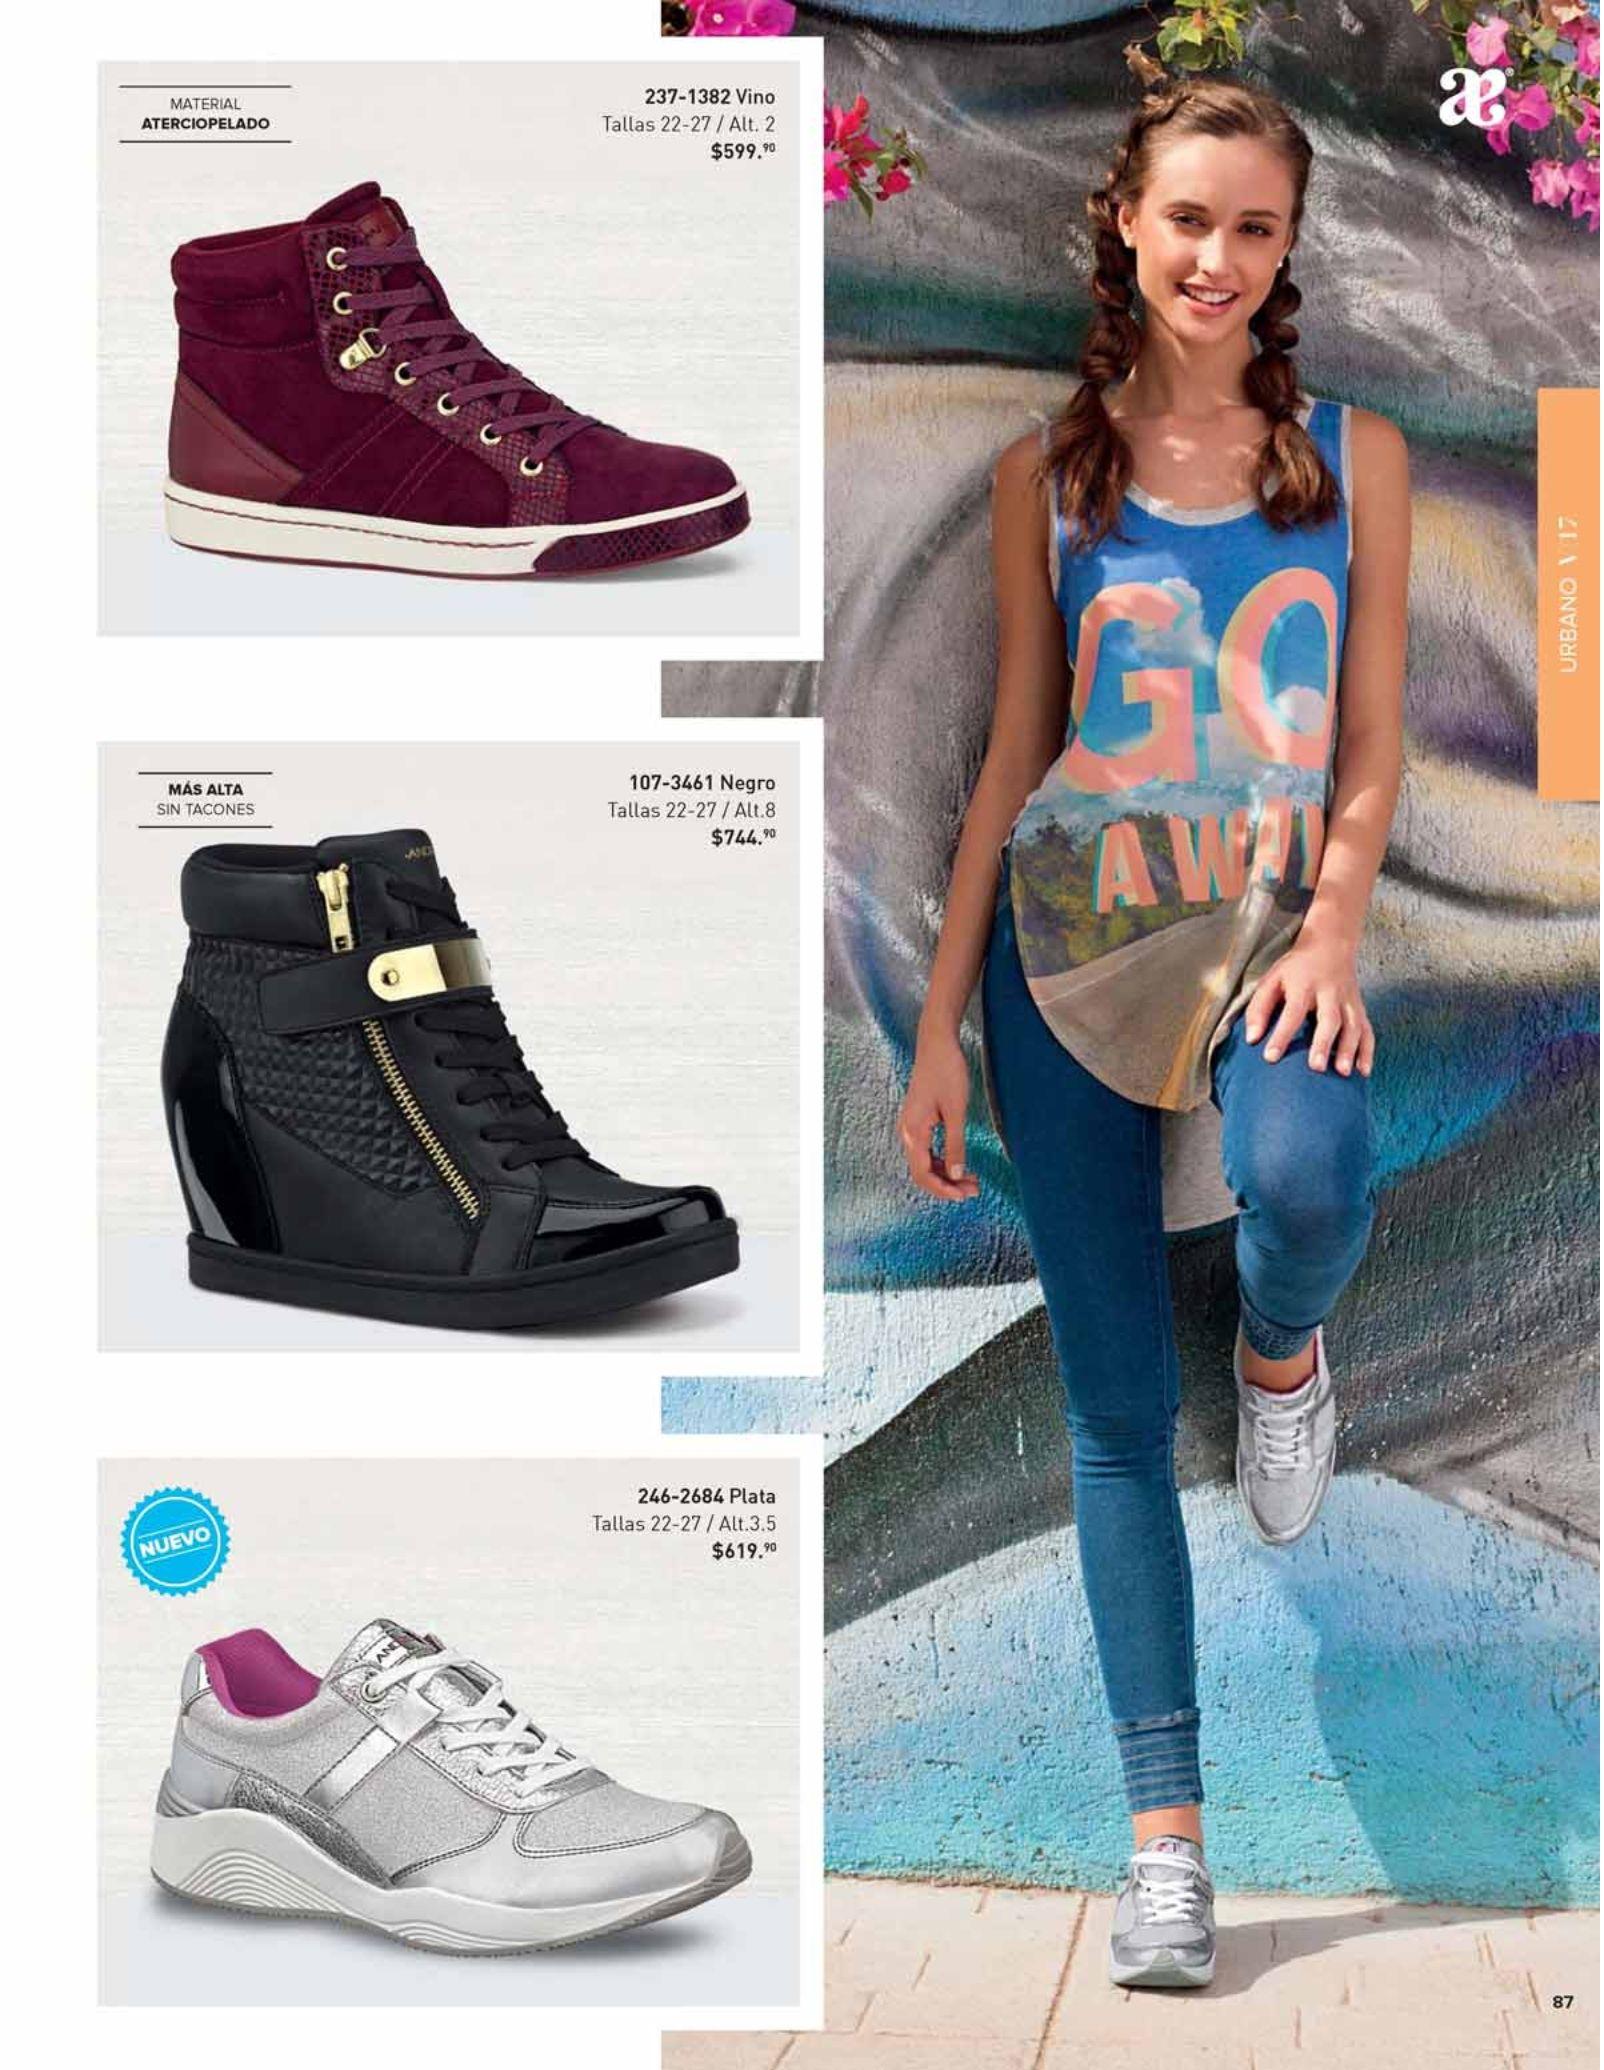 Andrea  Catalogo de Zapatos para Dama Verano 2017 Mexico  885c0ca8d62